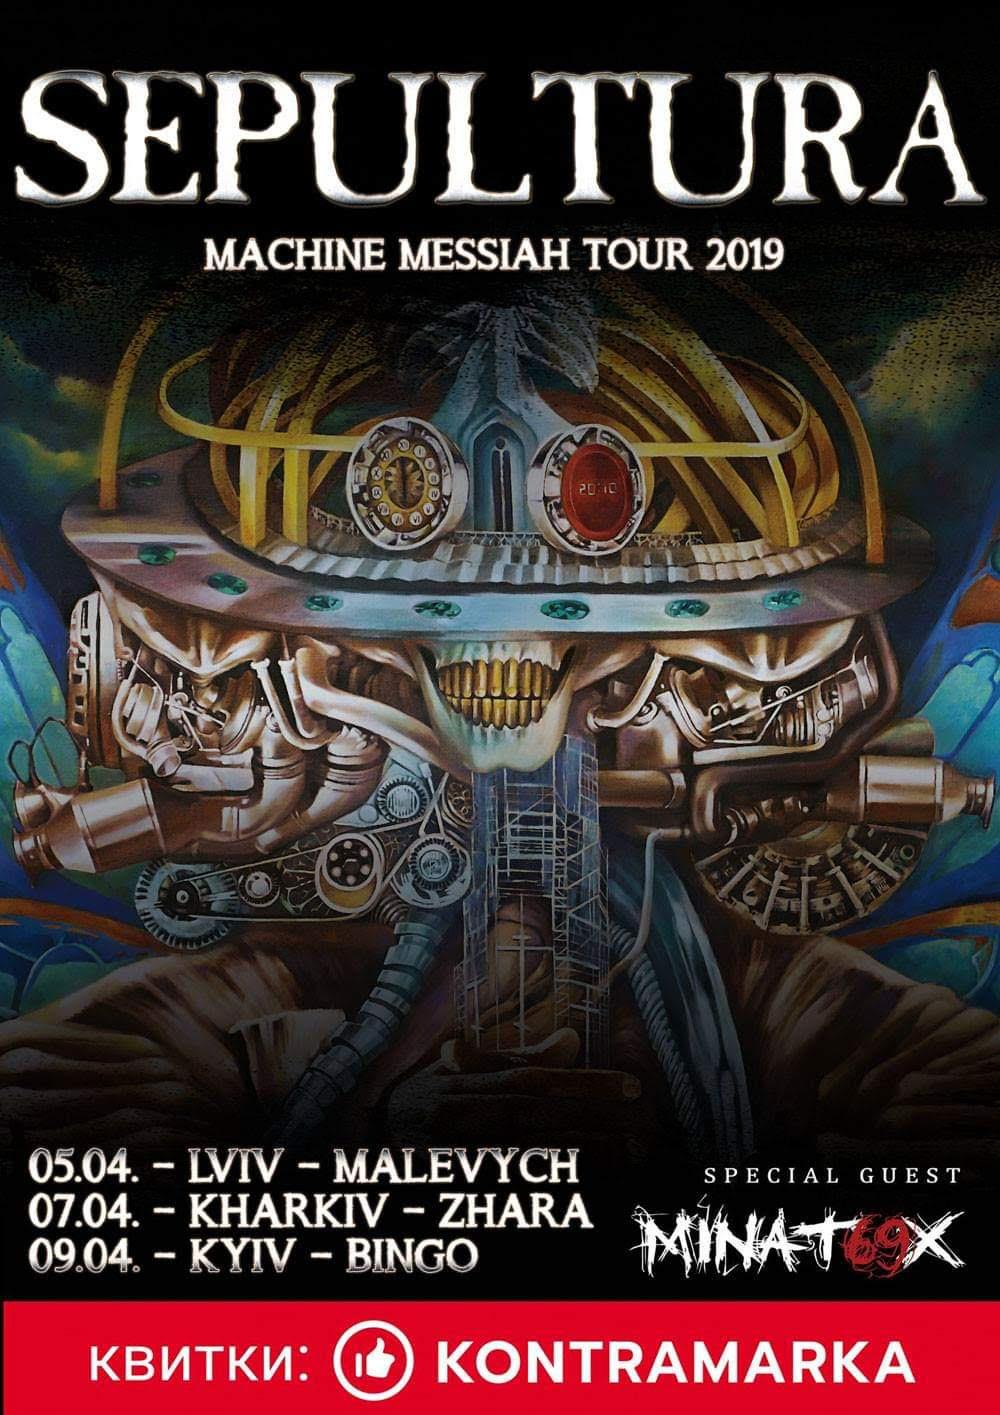 Sepultura minatox69 Ukraina tour